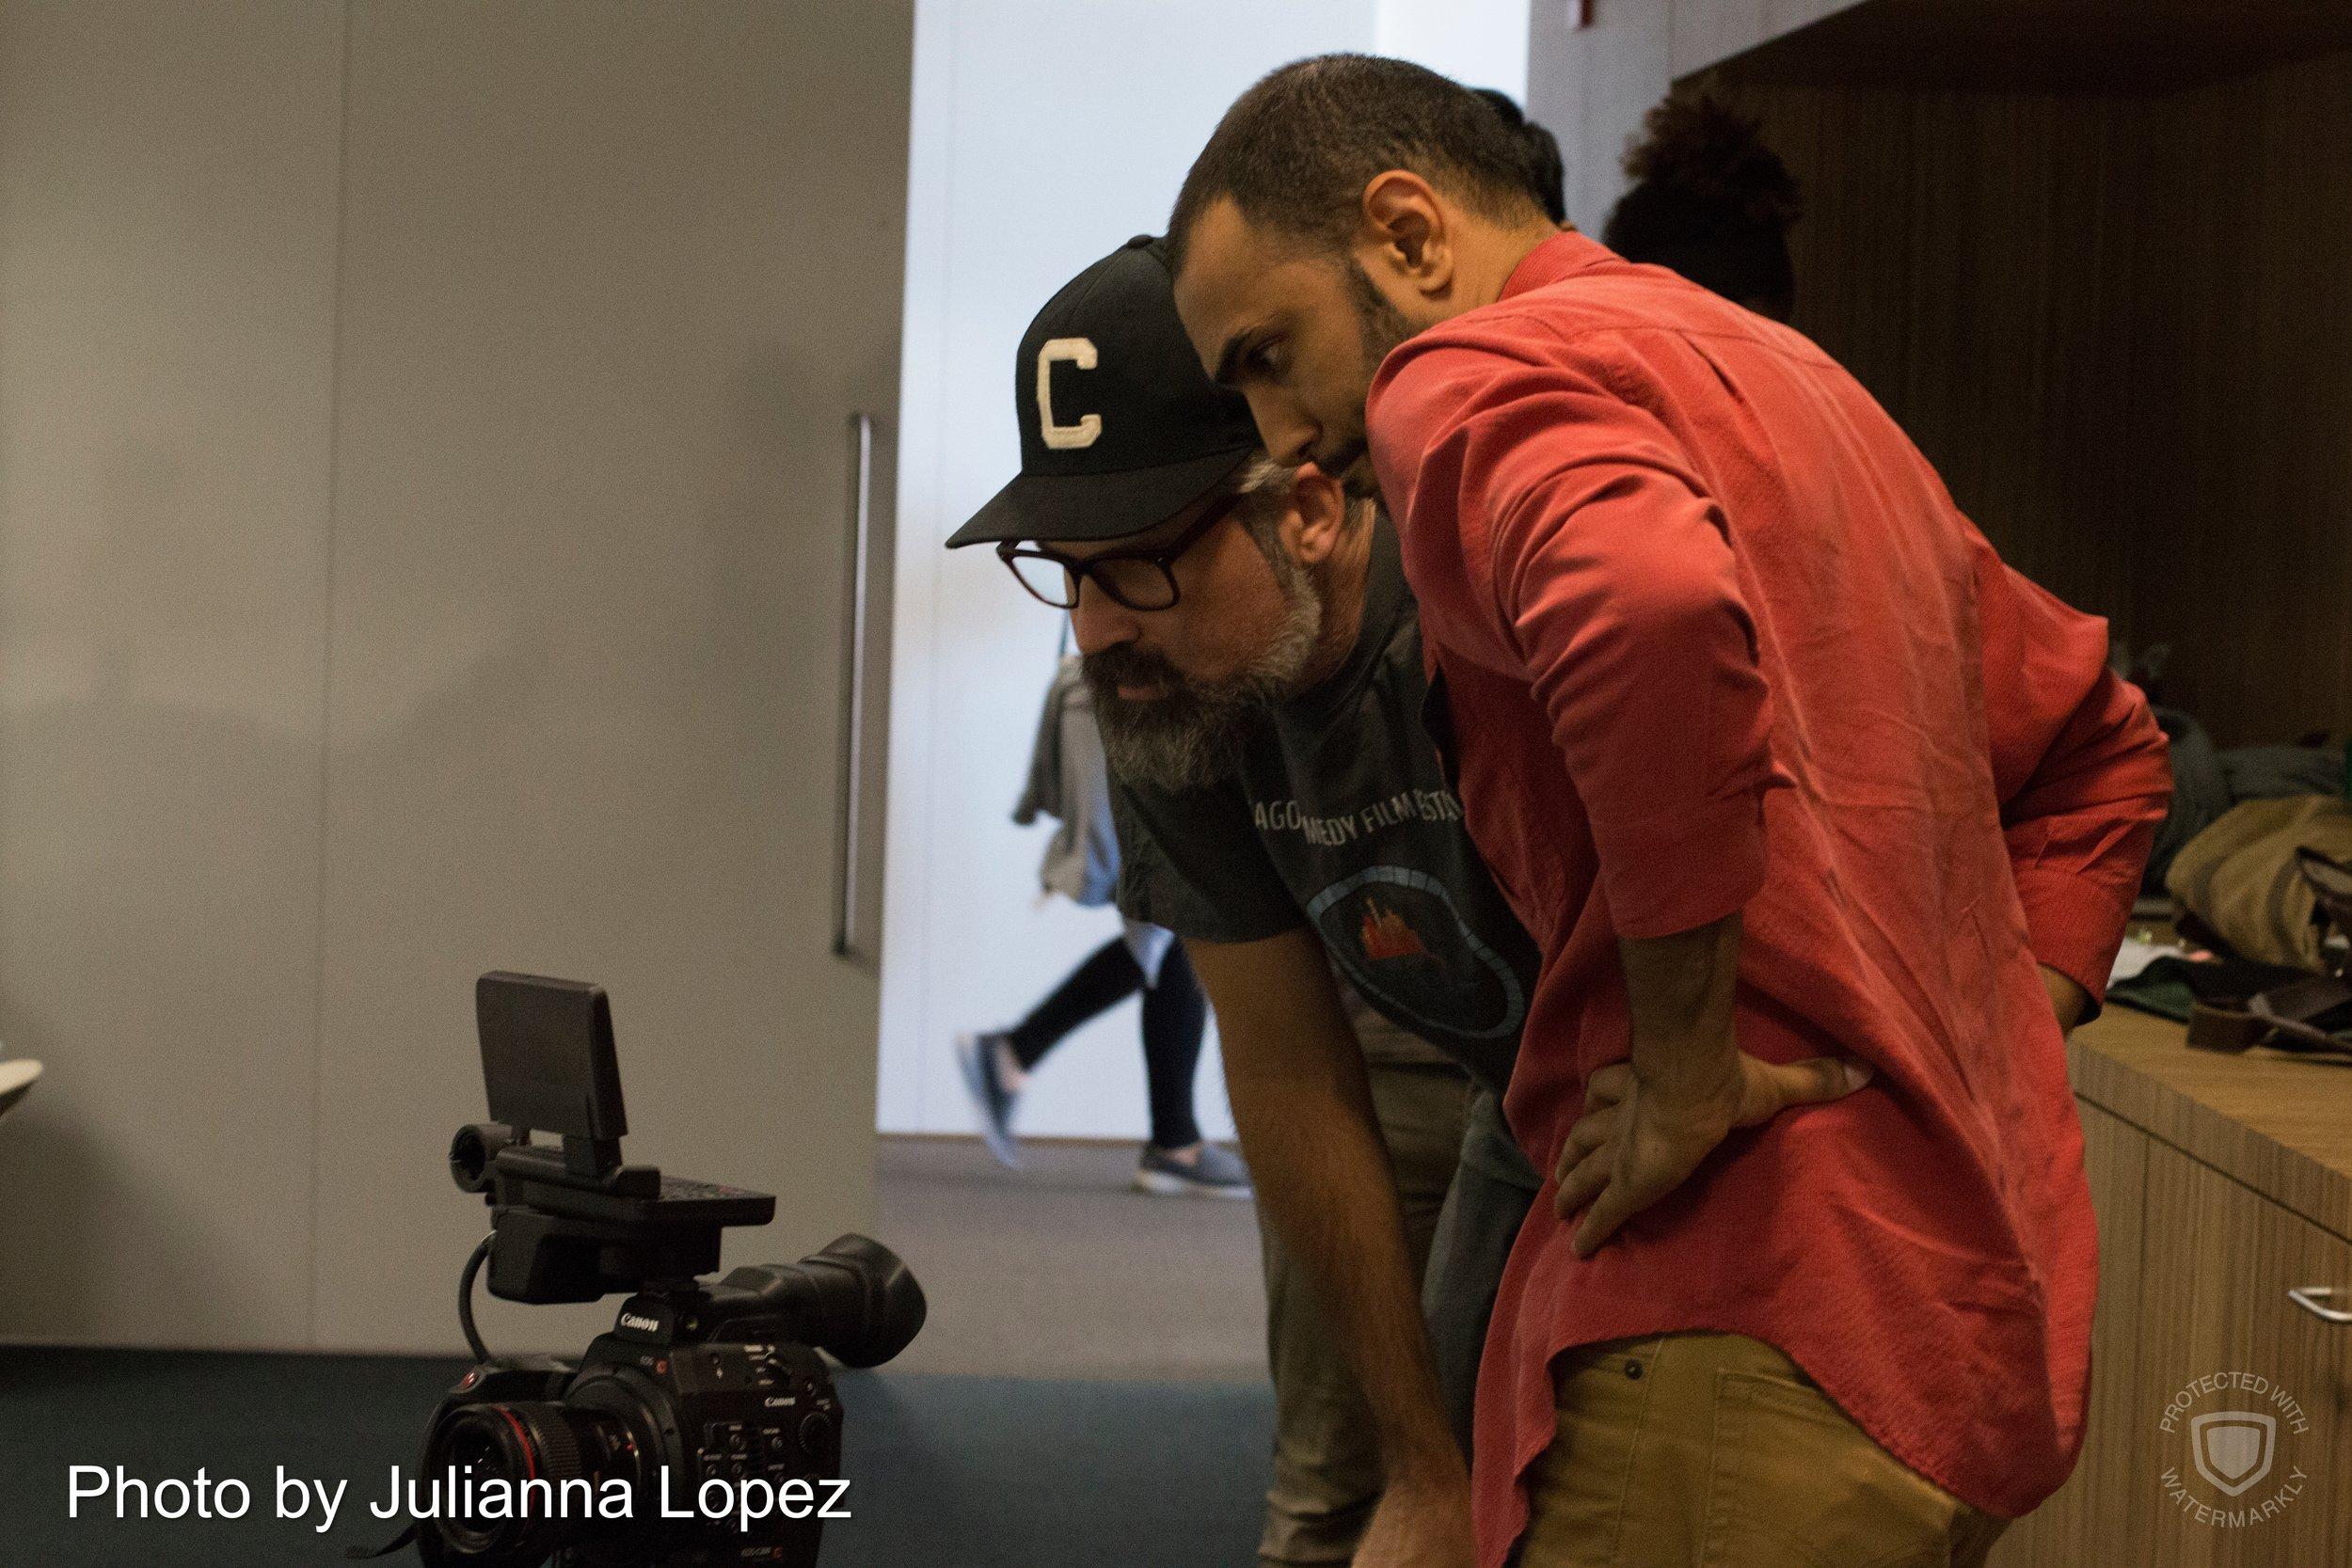 Julianna Lopez - IMG_6285.jpg